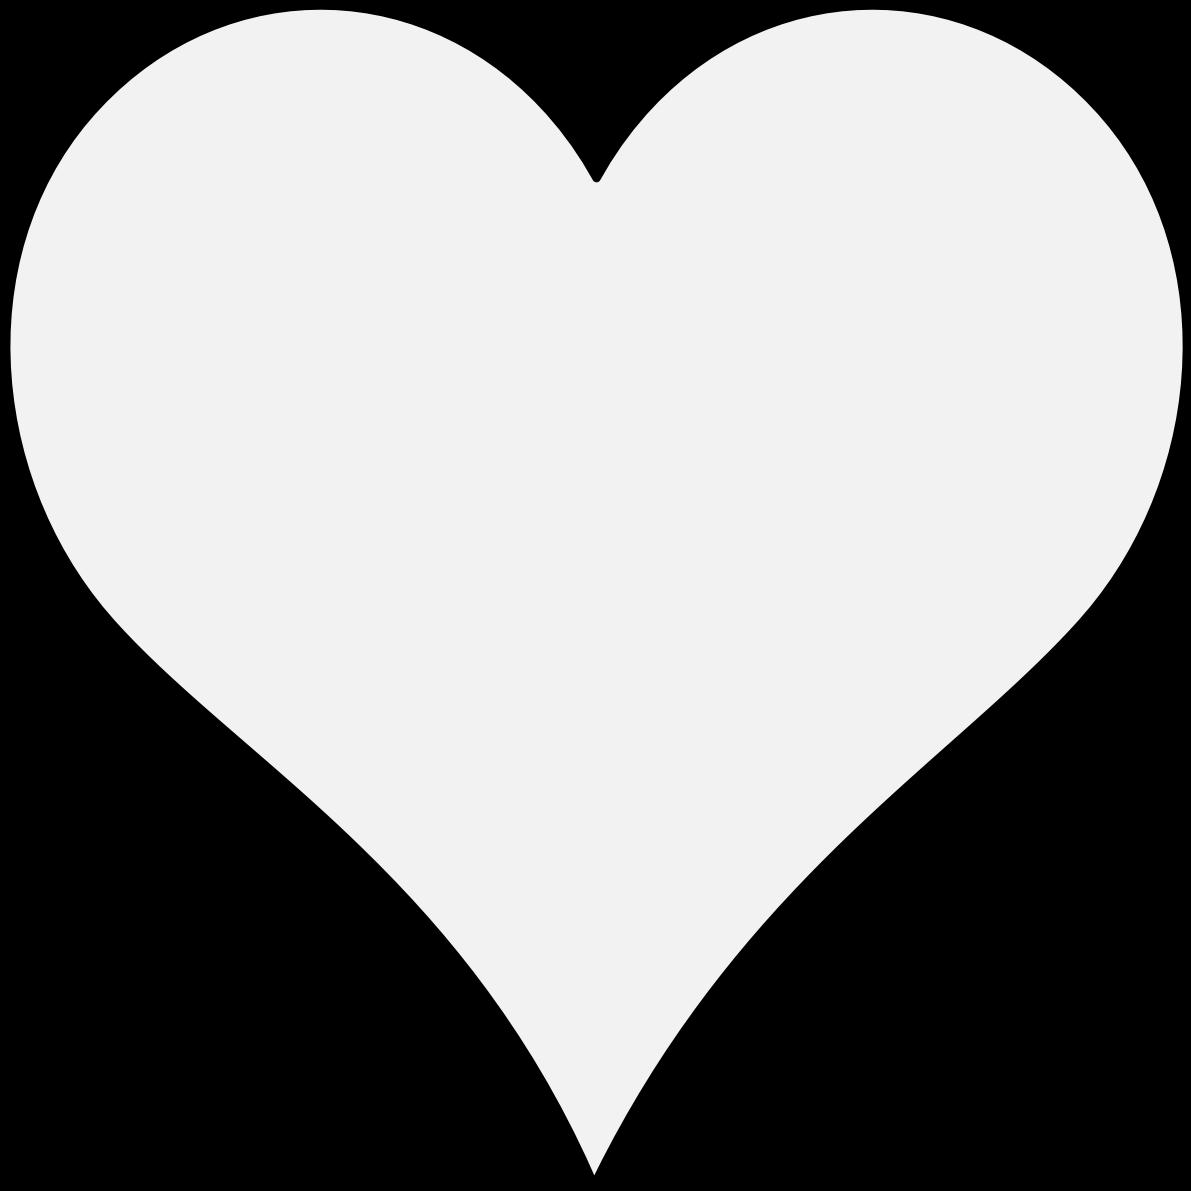 Pdf - White Heart Icon Transparent Background Clipart - Full